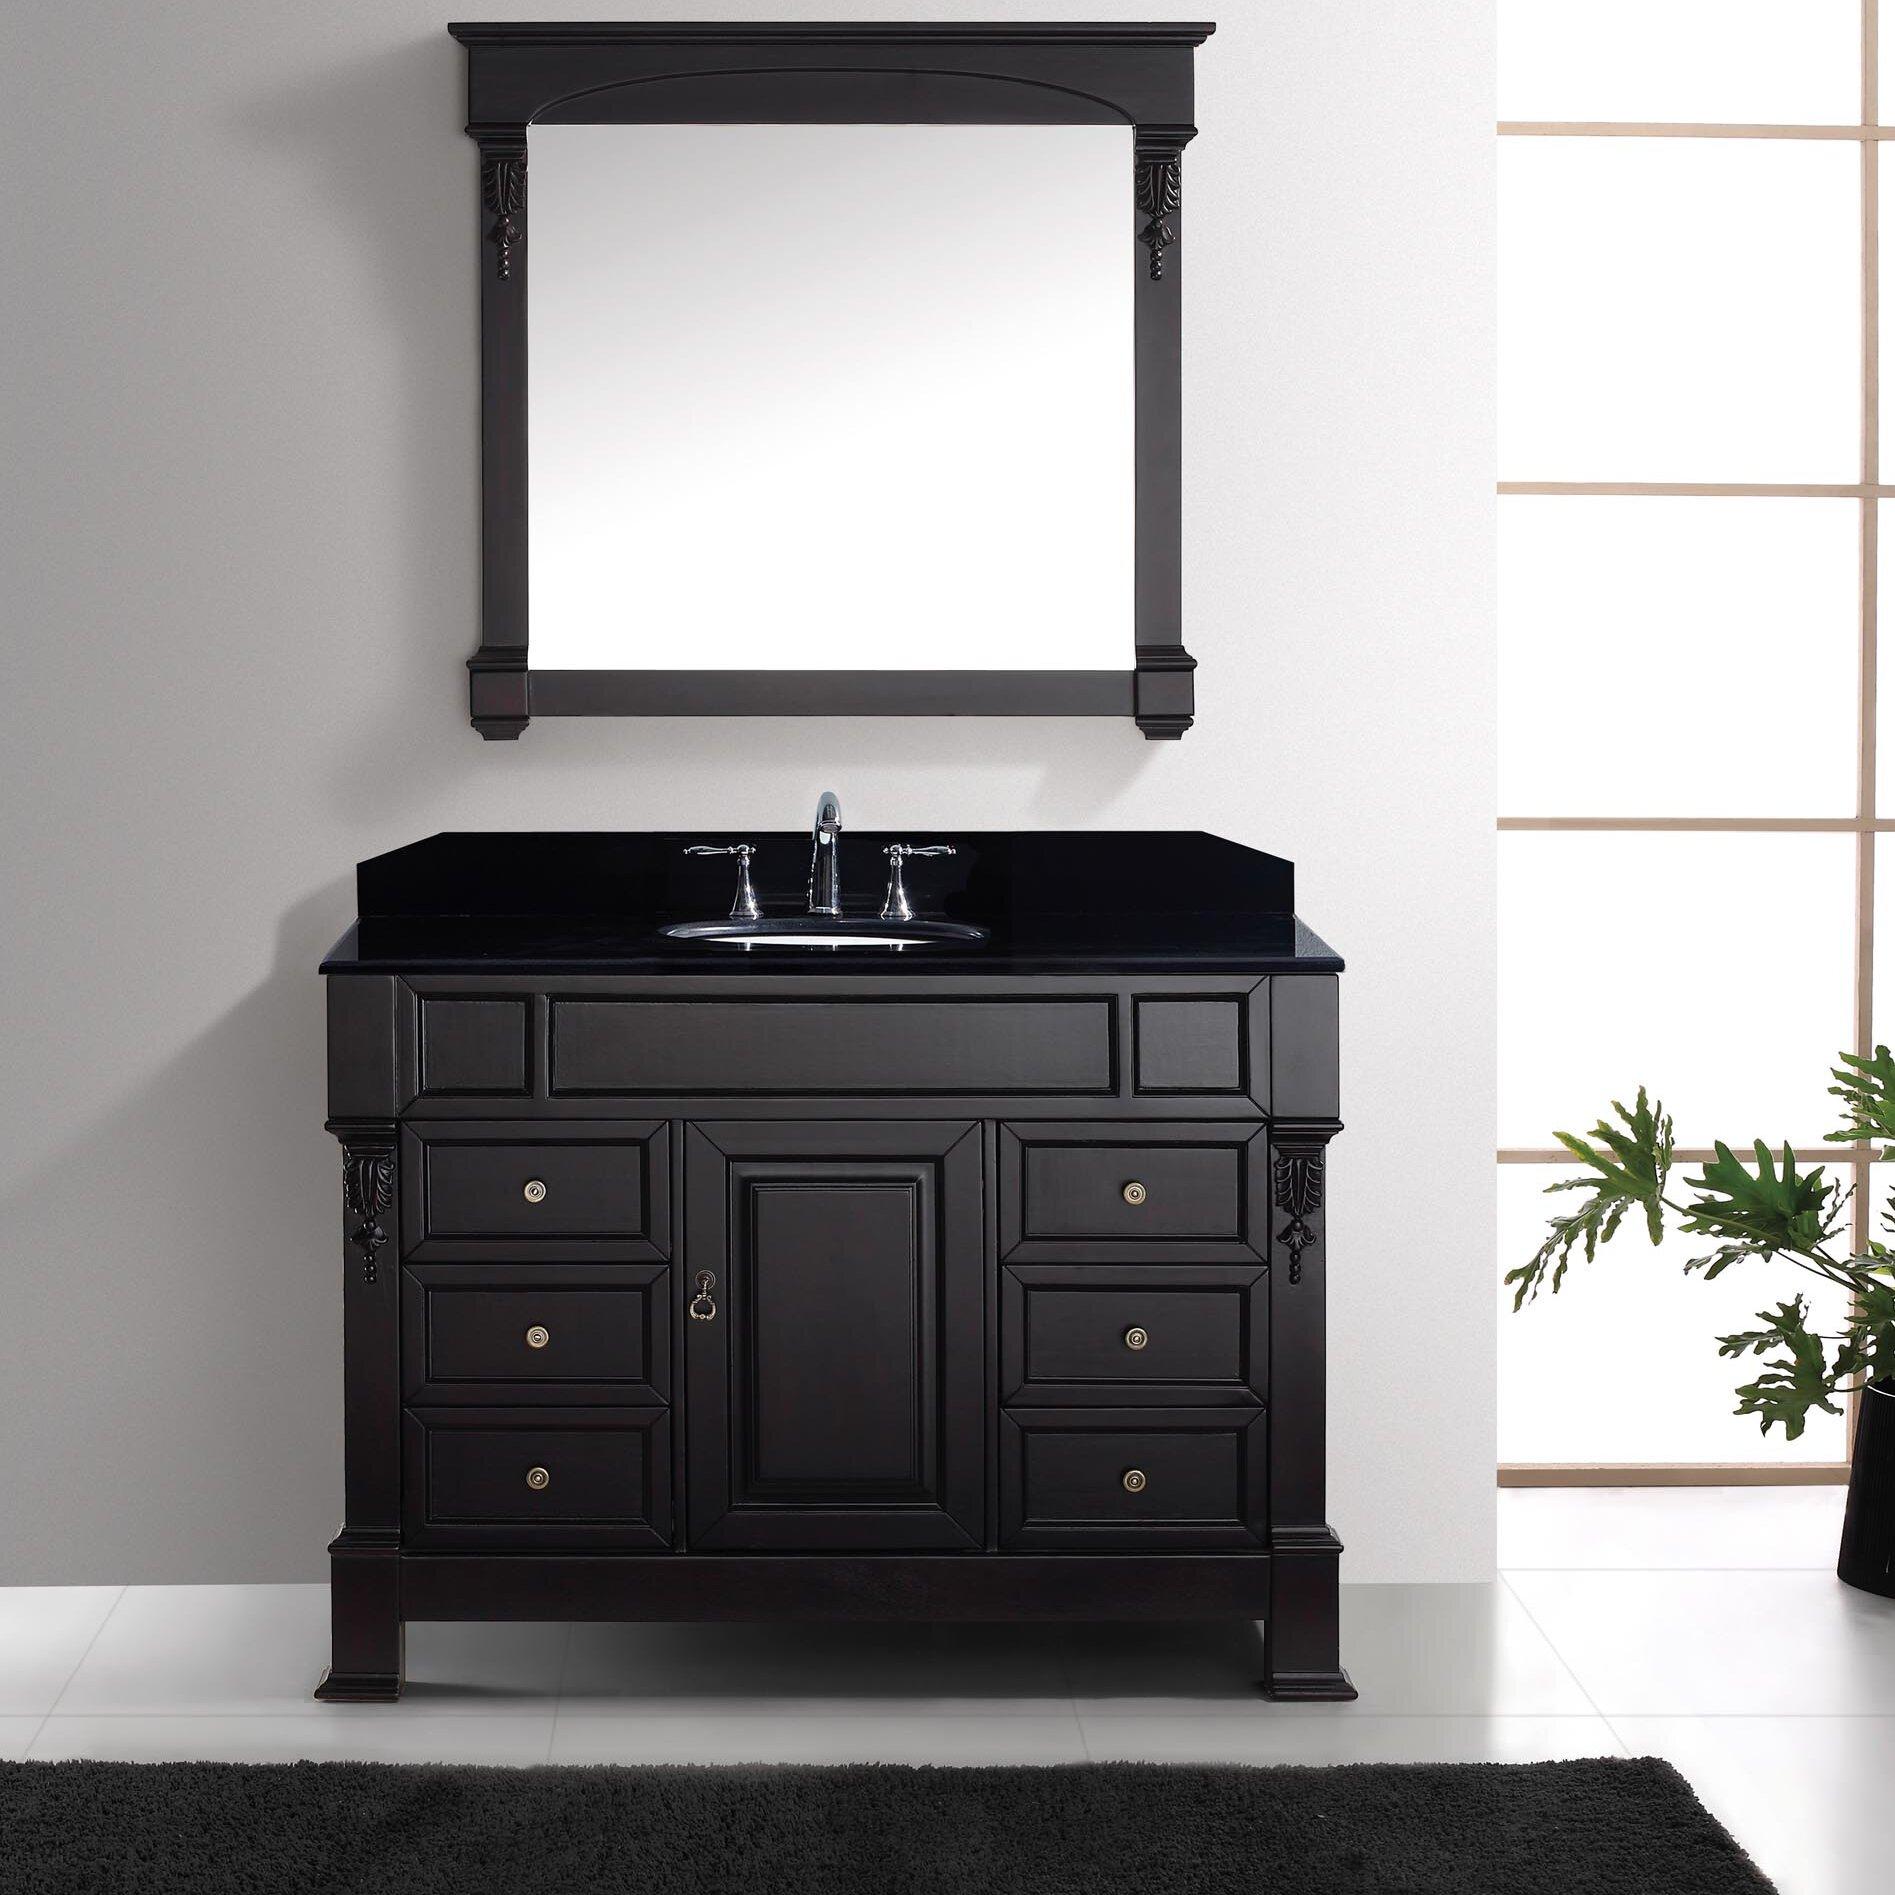 virtu victoria 47 3 single bathroom vanity set with black galaxy top